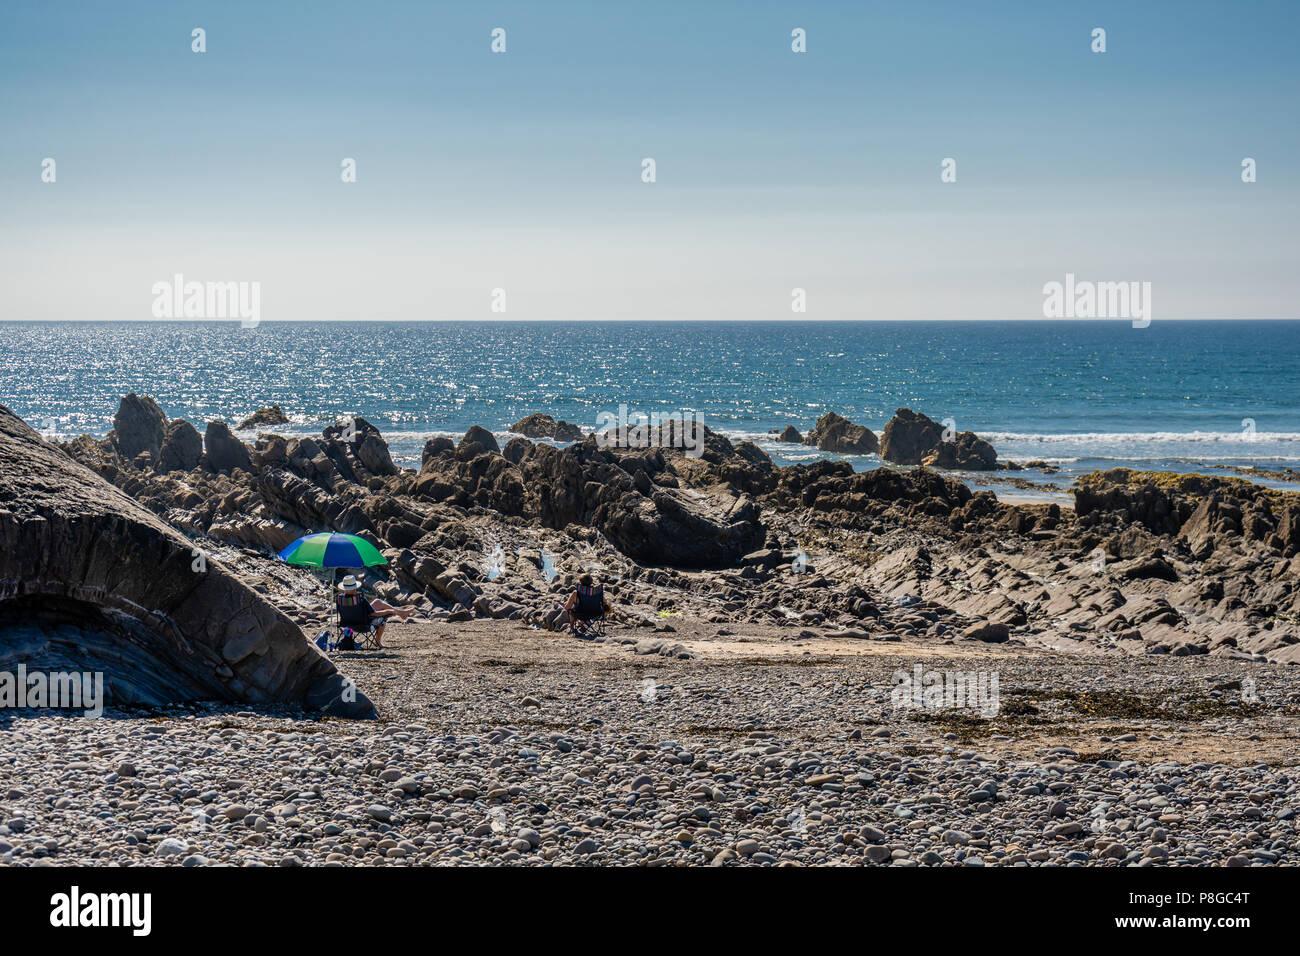 Shingle beach and rock formations along Bude Atlantic Ocean beach, Bude, North Cornwall, Cornwall, England, UK Stock Photo